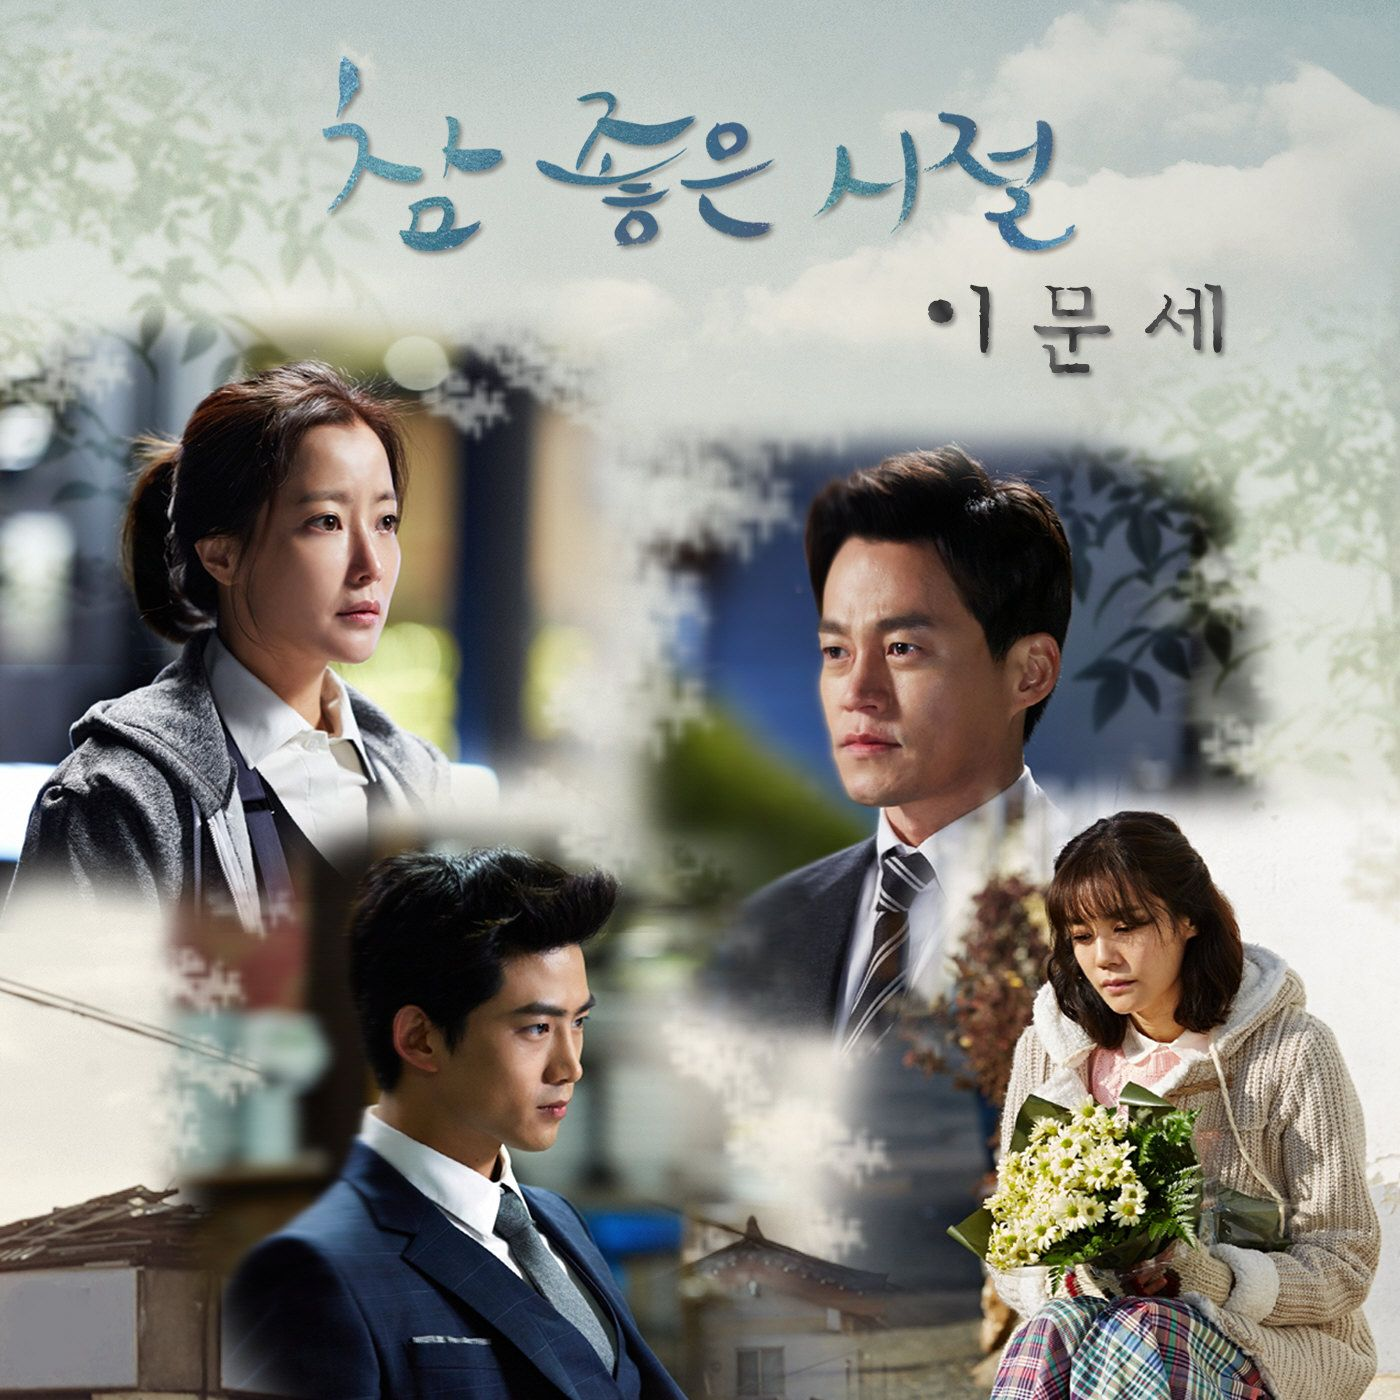 [Single] Lee Moon Sae - Wonderful Days OST Part.5